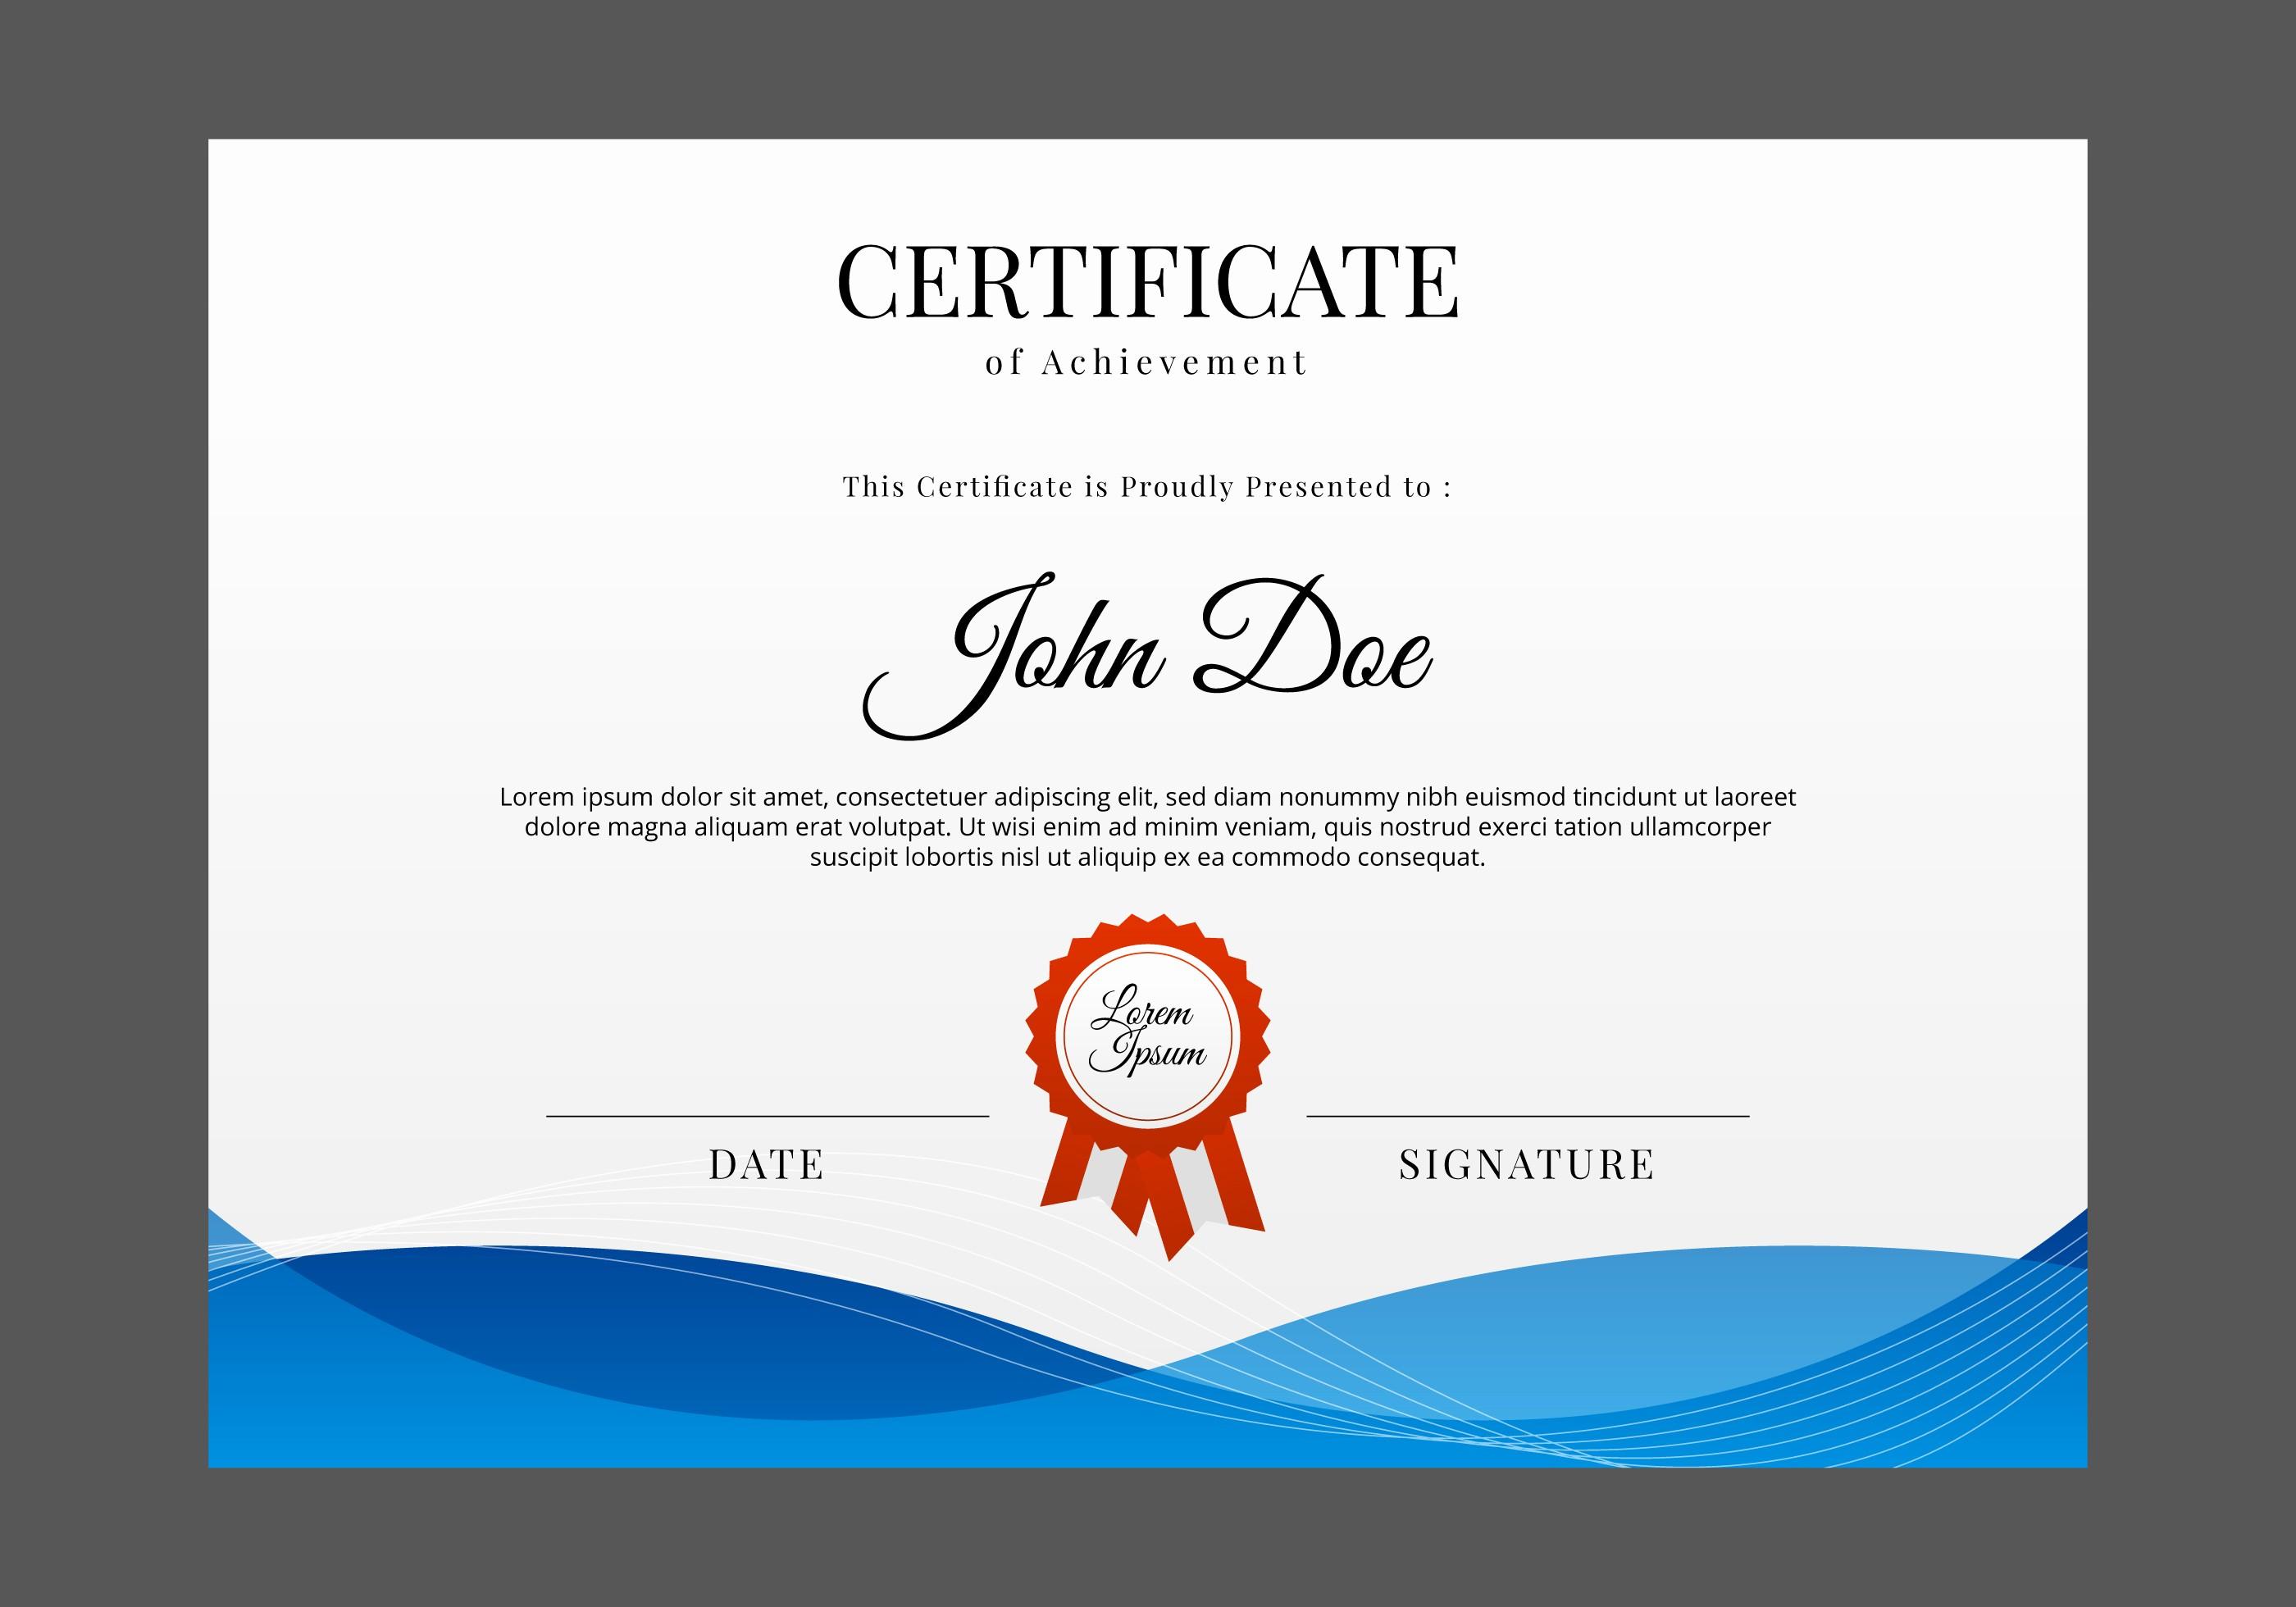 Free Online Certificate Maker software Elegant Certificate Template Free Vector Art Free Downloads